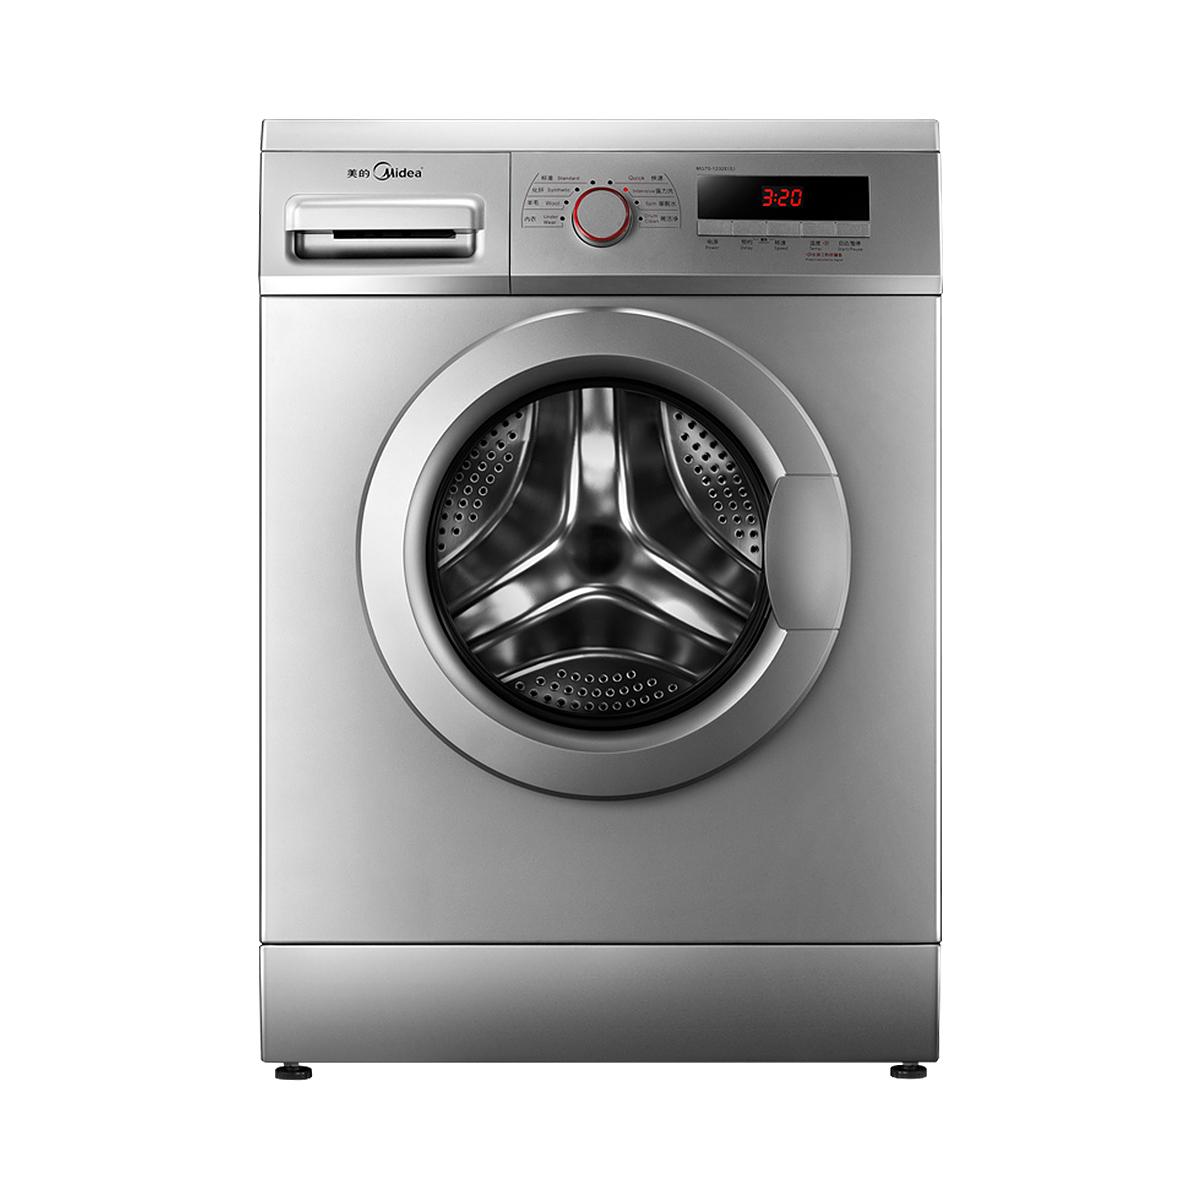 Midea/美的 MG70-1232E(S)洗衣机 说明书.pdf